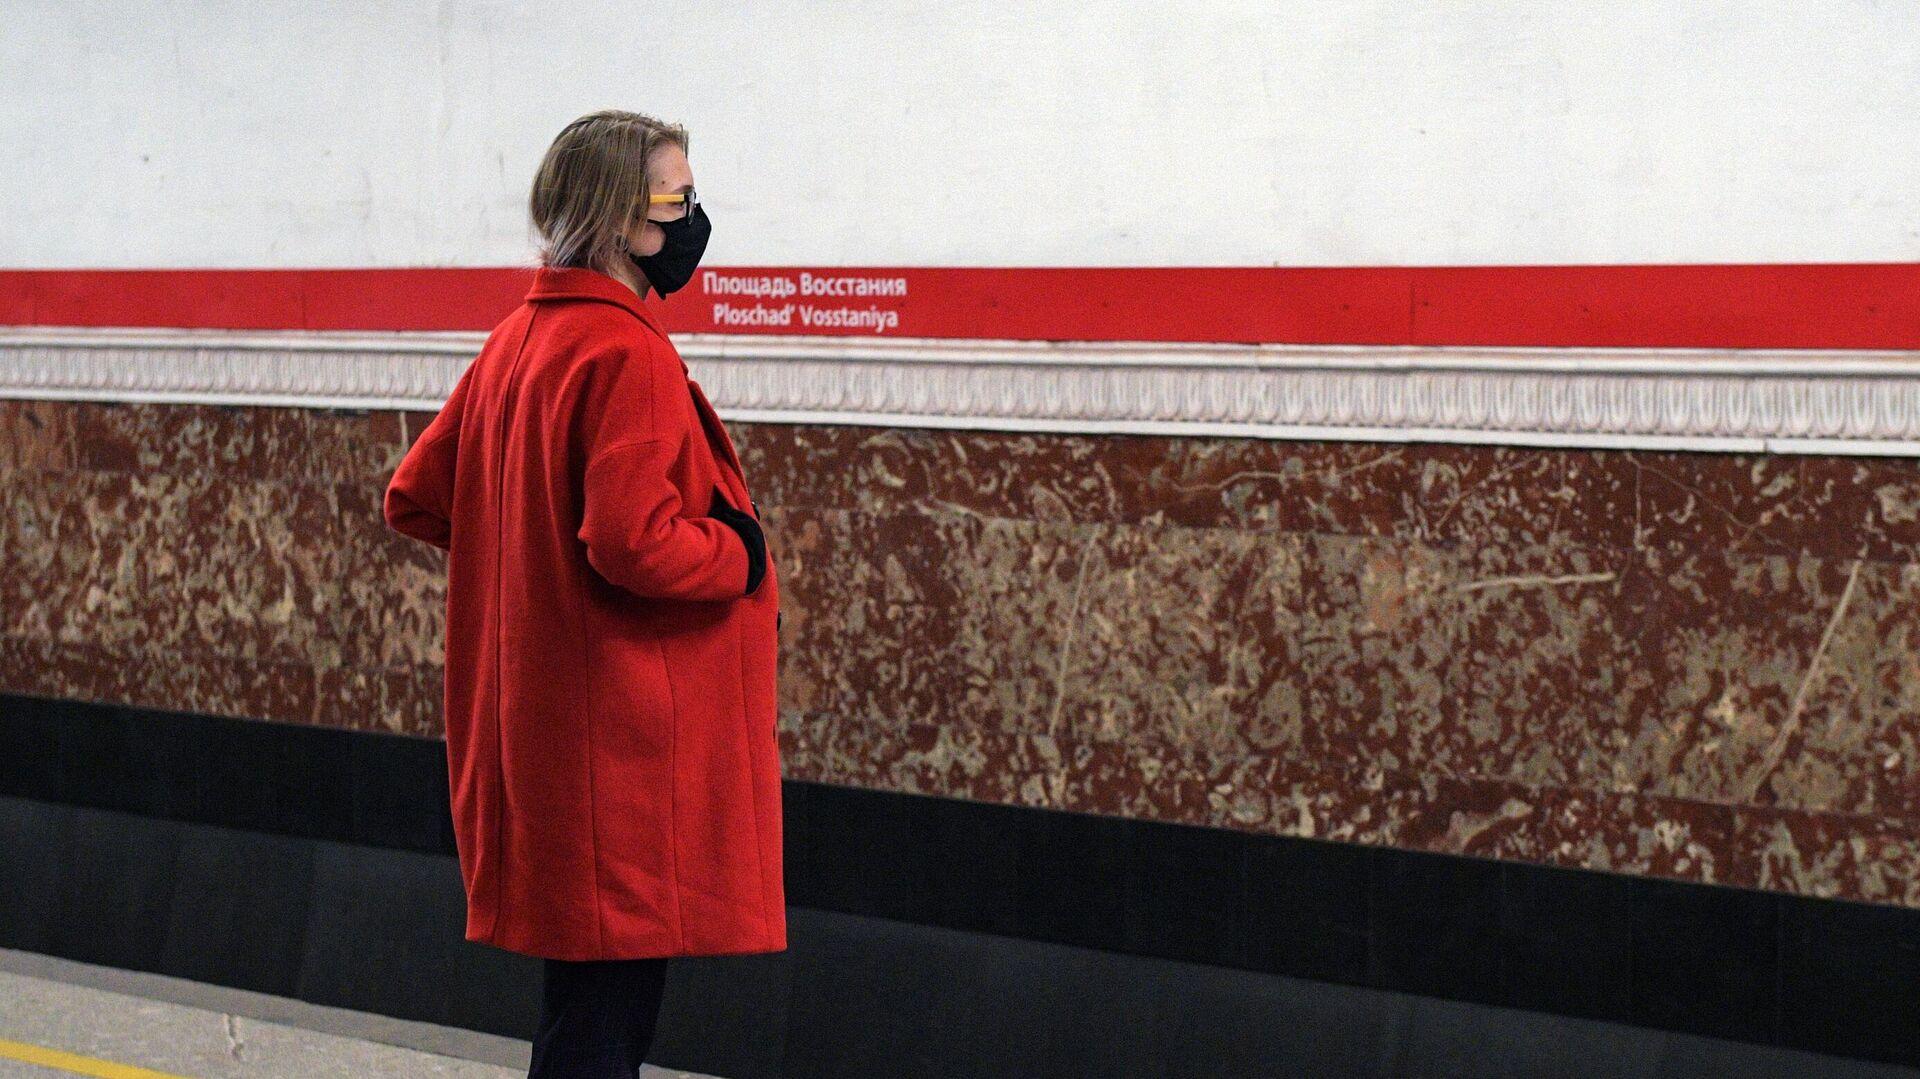 Пассажирка петербургского метрополитена в маске - РИА Новости, 1920, 08.10.2020